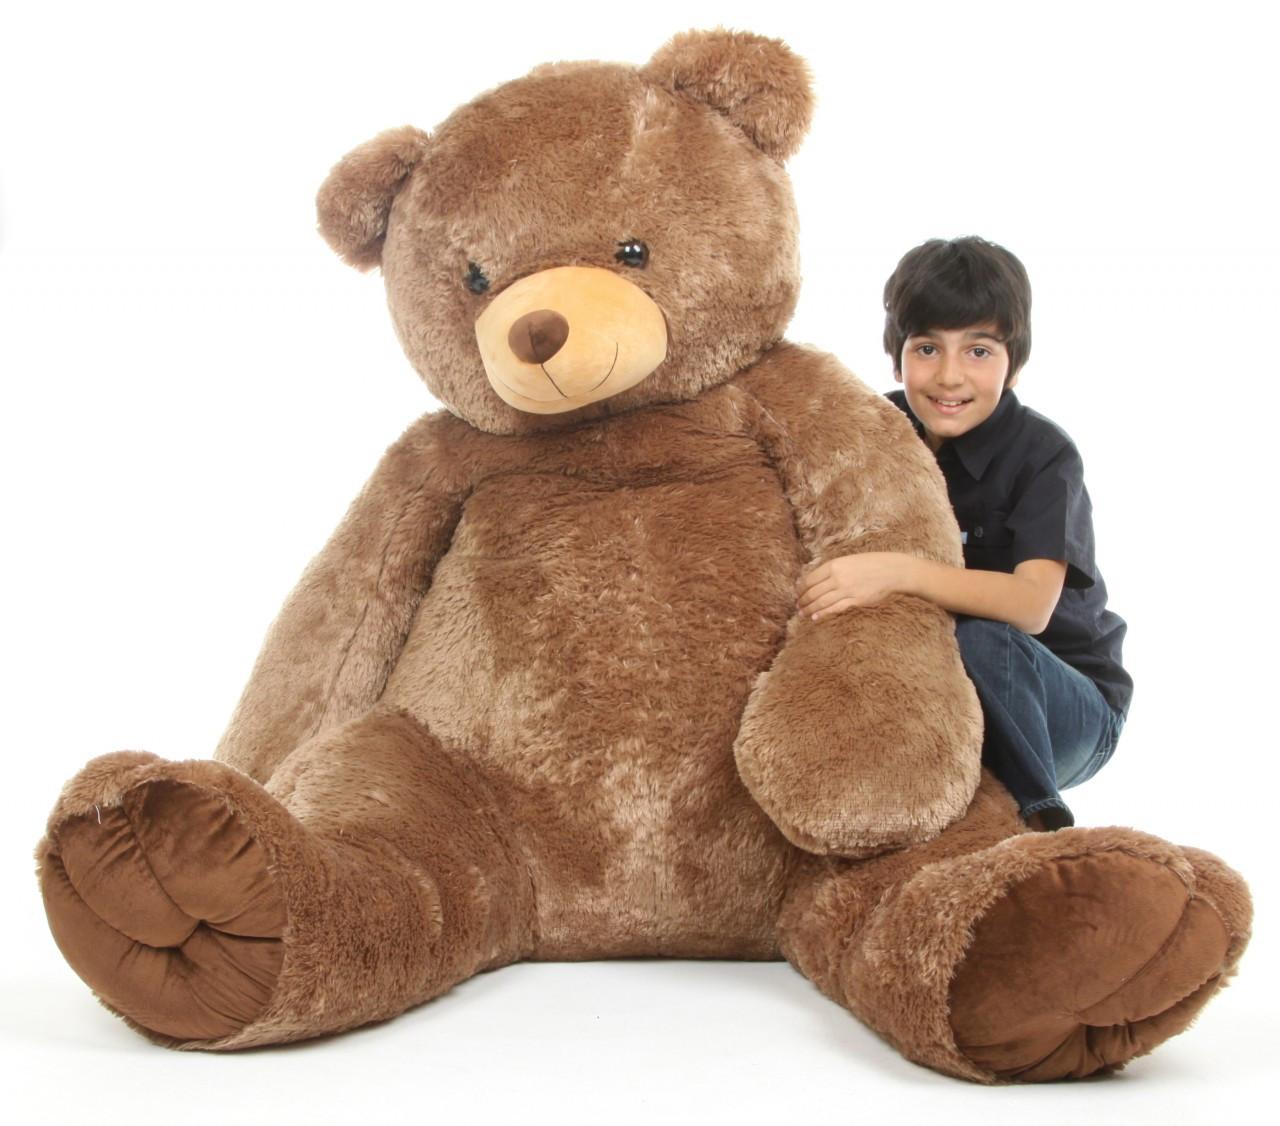 Sweetie Tubs Extra Cuddly Huge Mocha Brown Teddy Bear 65 in.